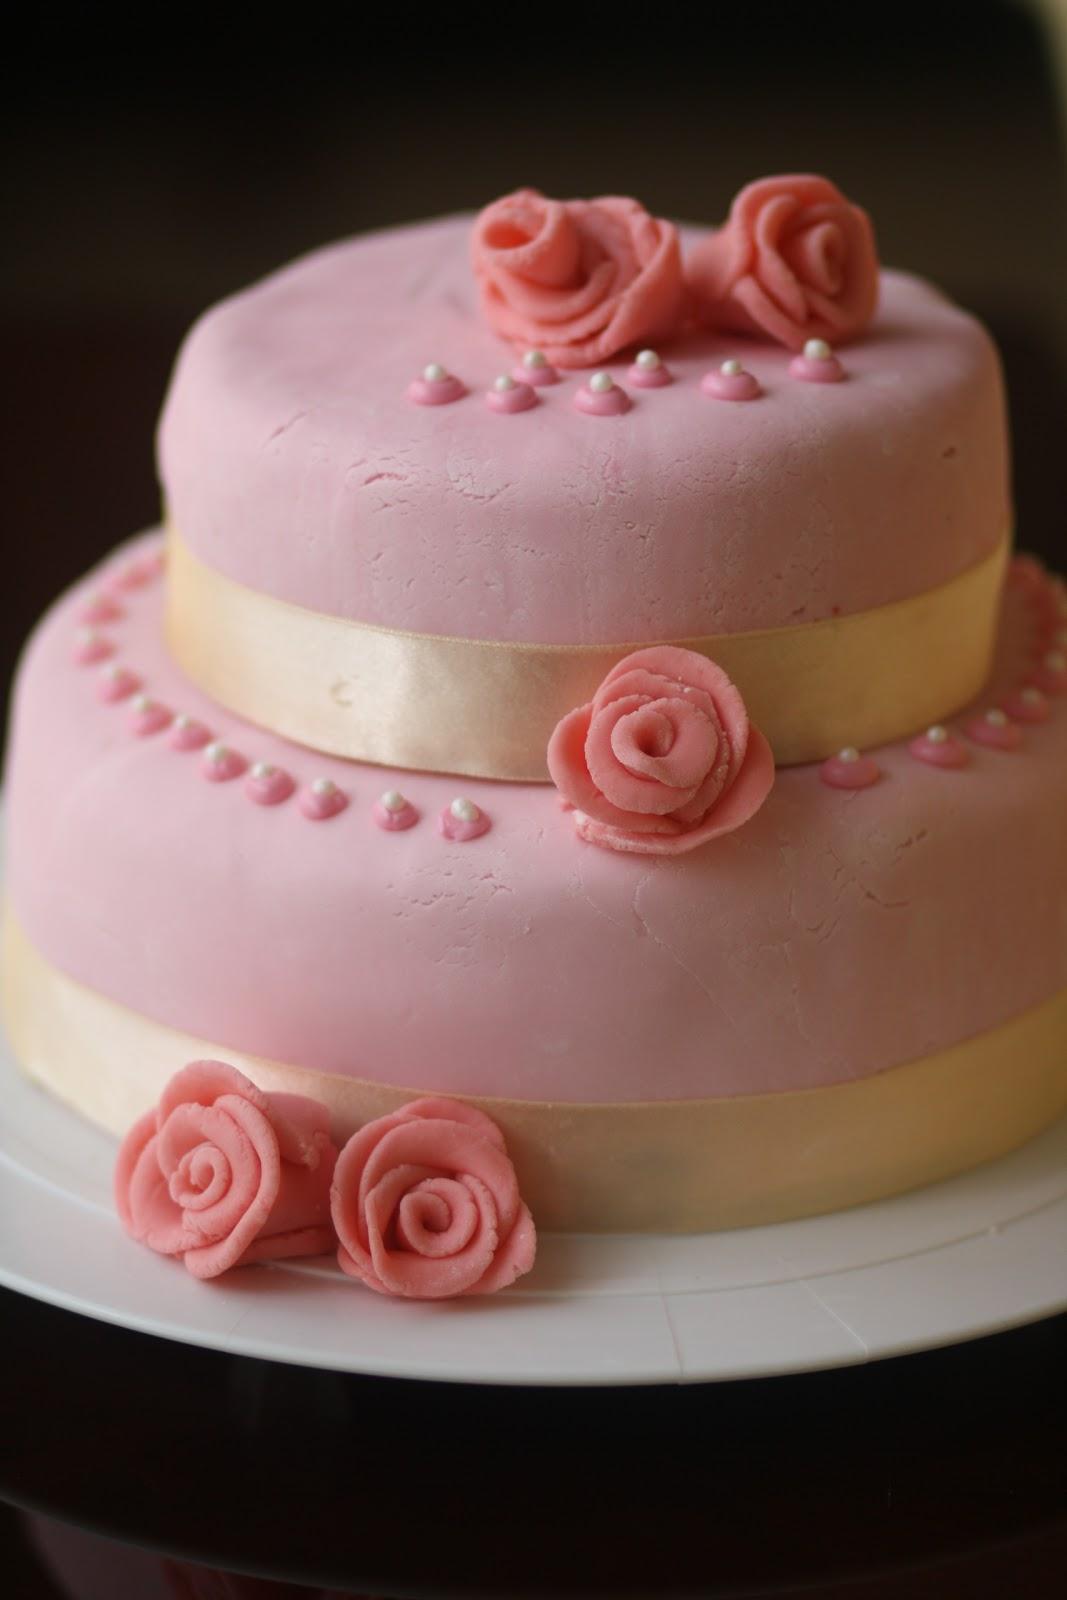 Spontaneous Euphoria Two Tiered Wedding Cake with Fondant